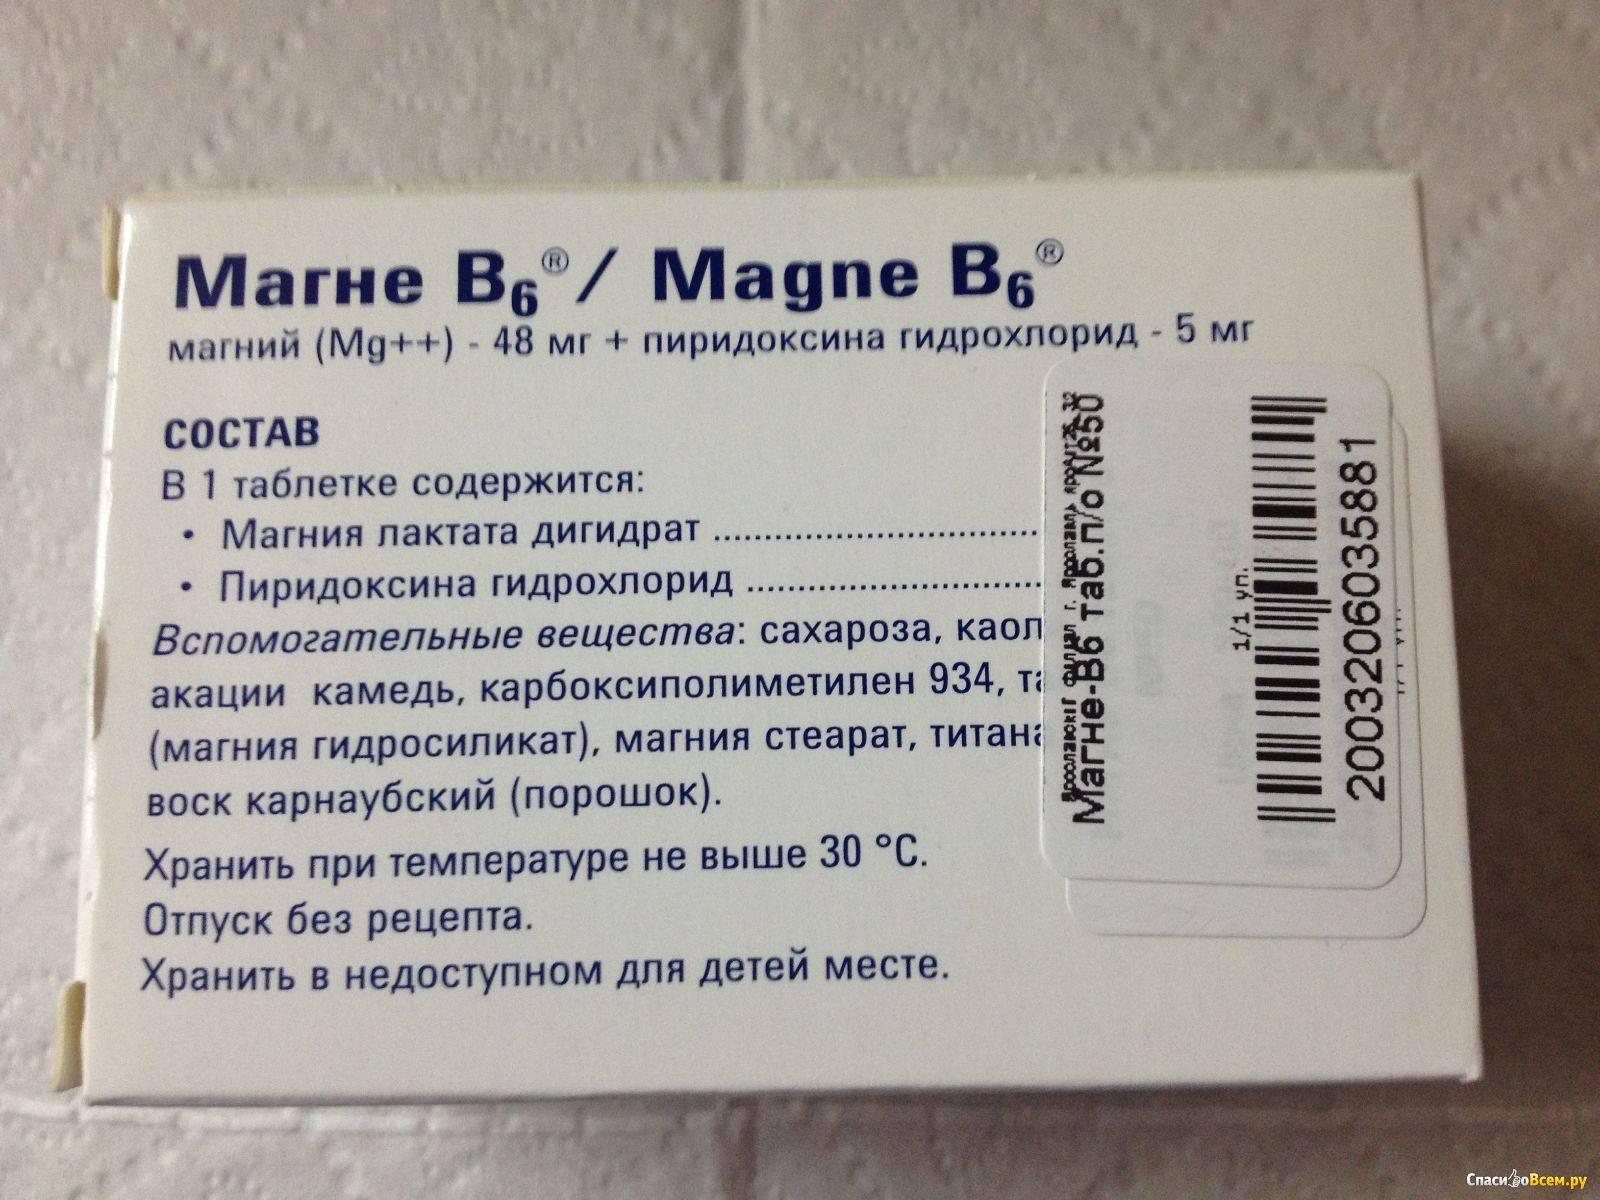 Чем отличается препарат магнелис от магнелиса форте